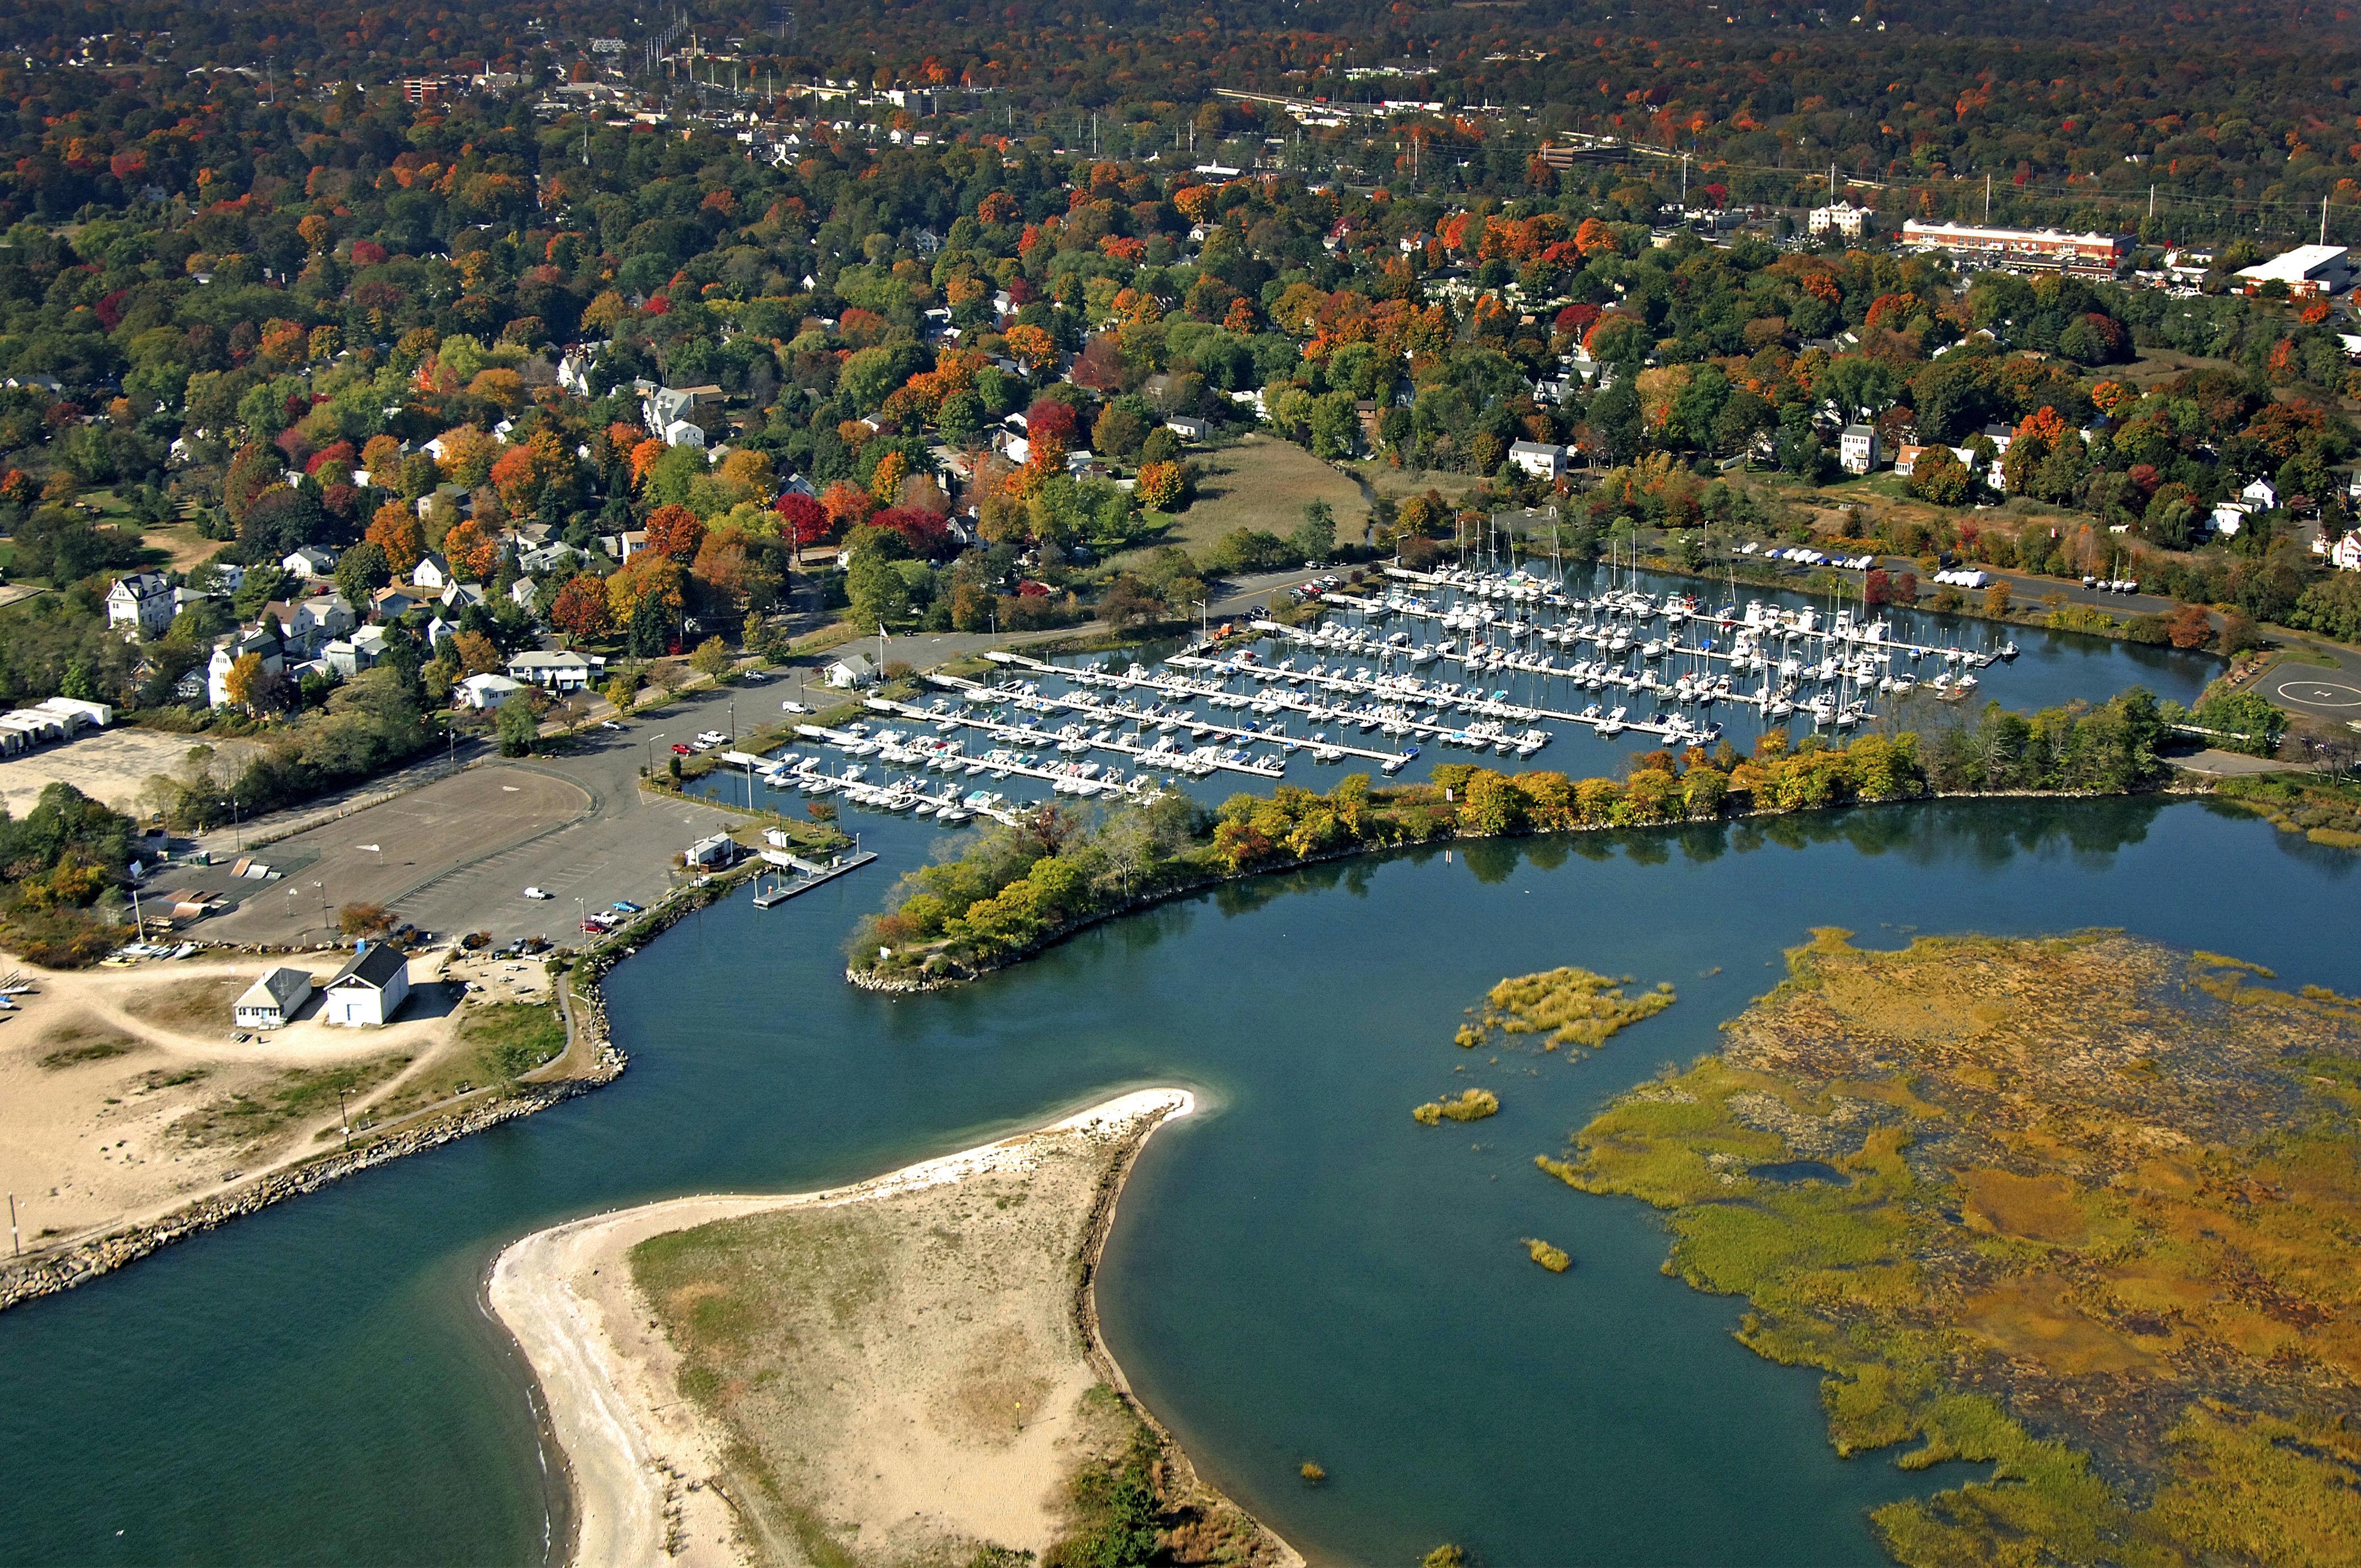 South Benson Marina In Fairfield Ct United States Marina Reviews